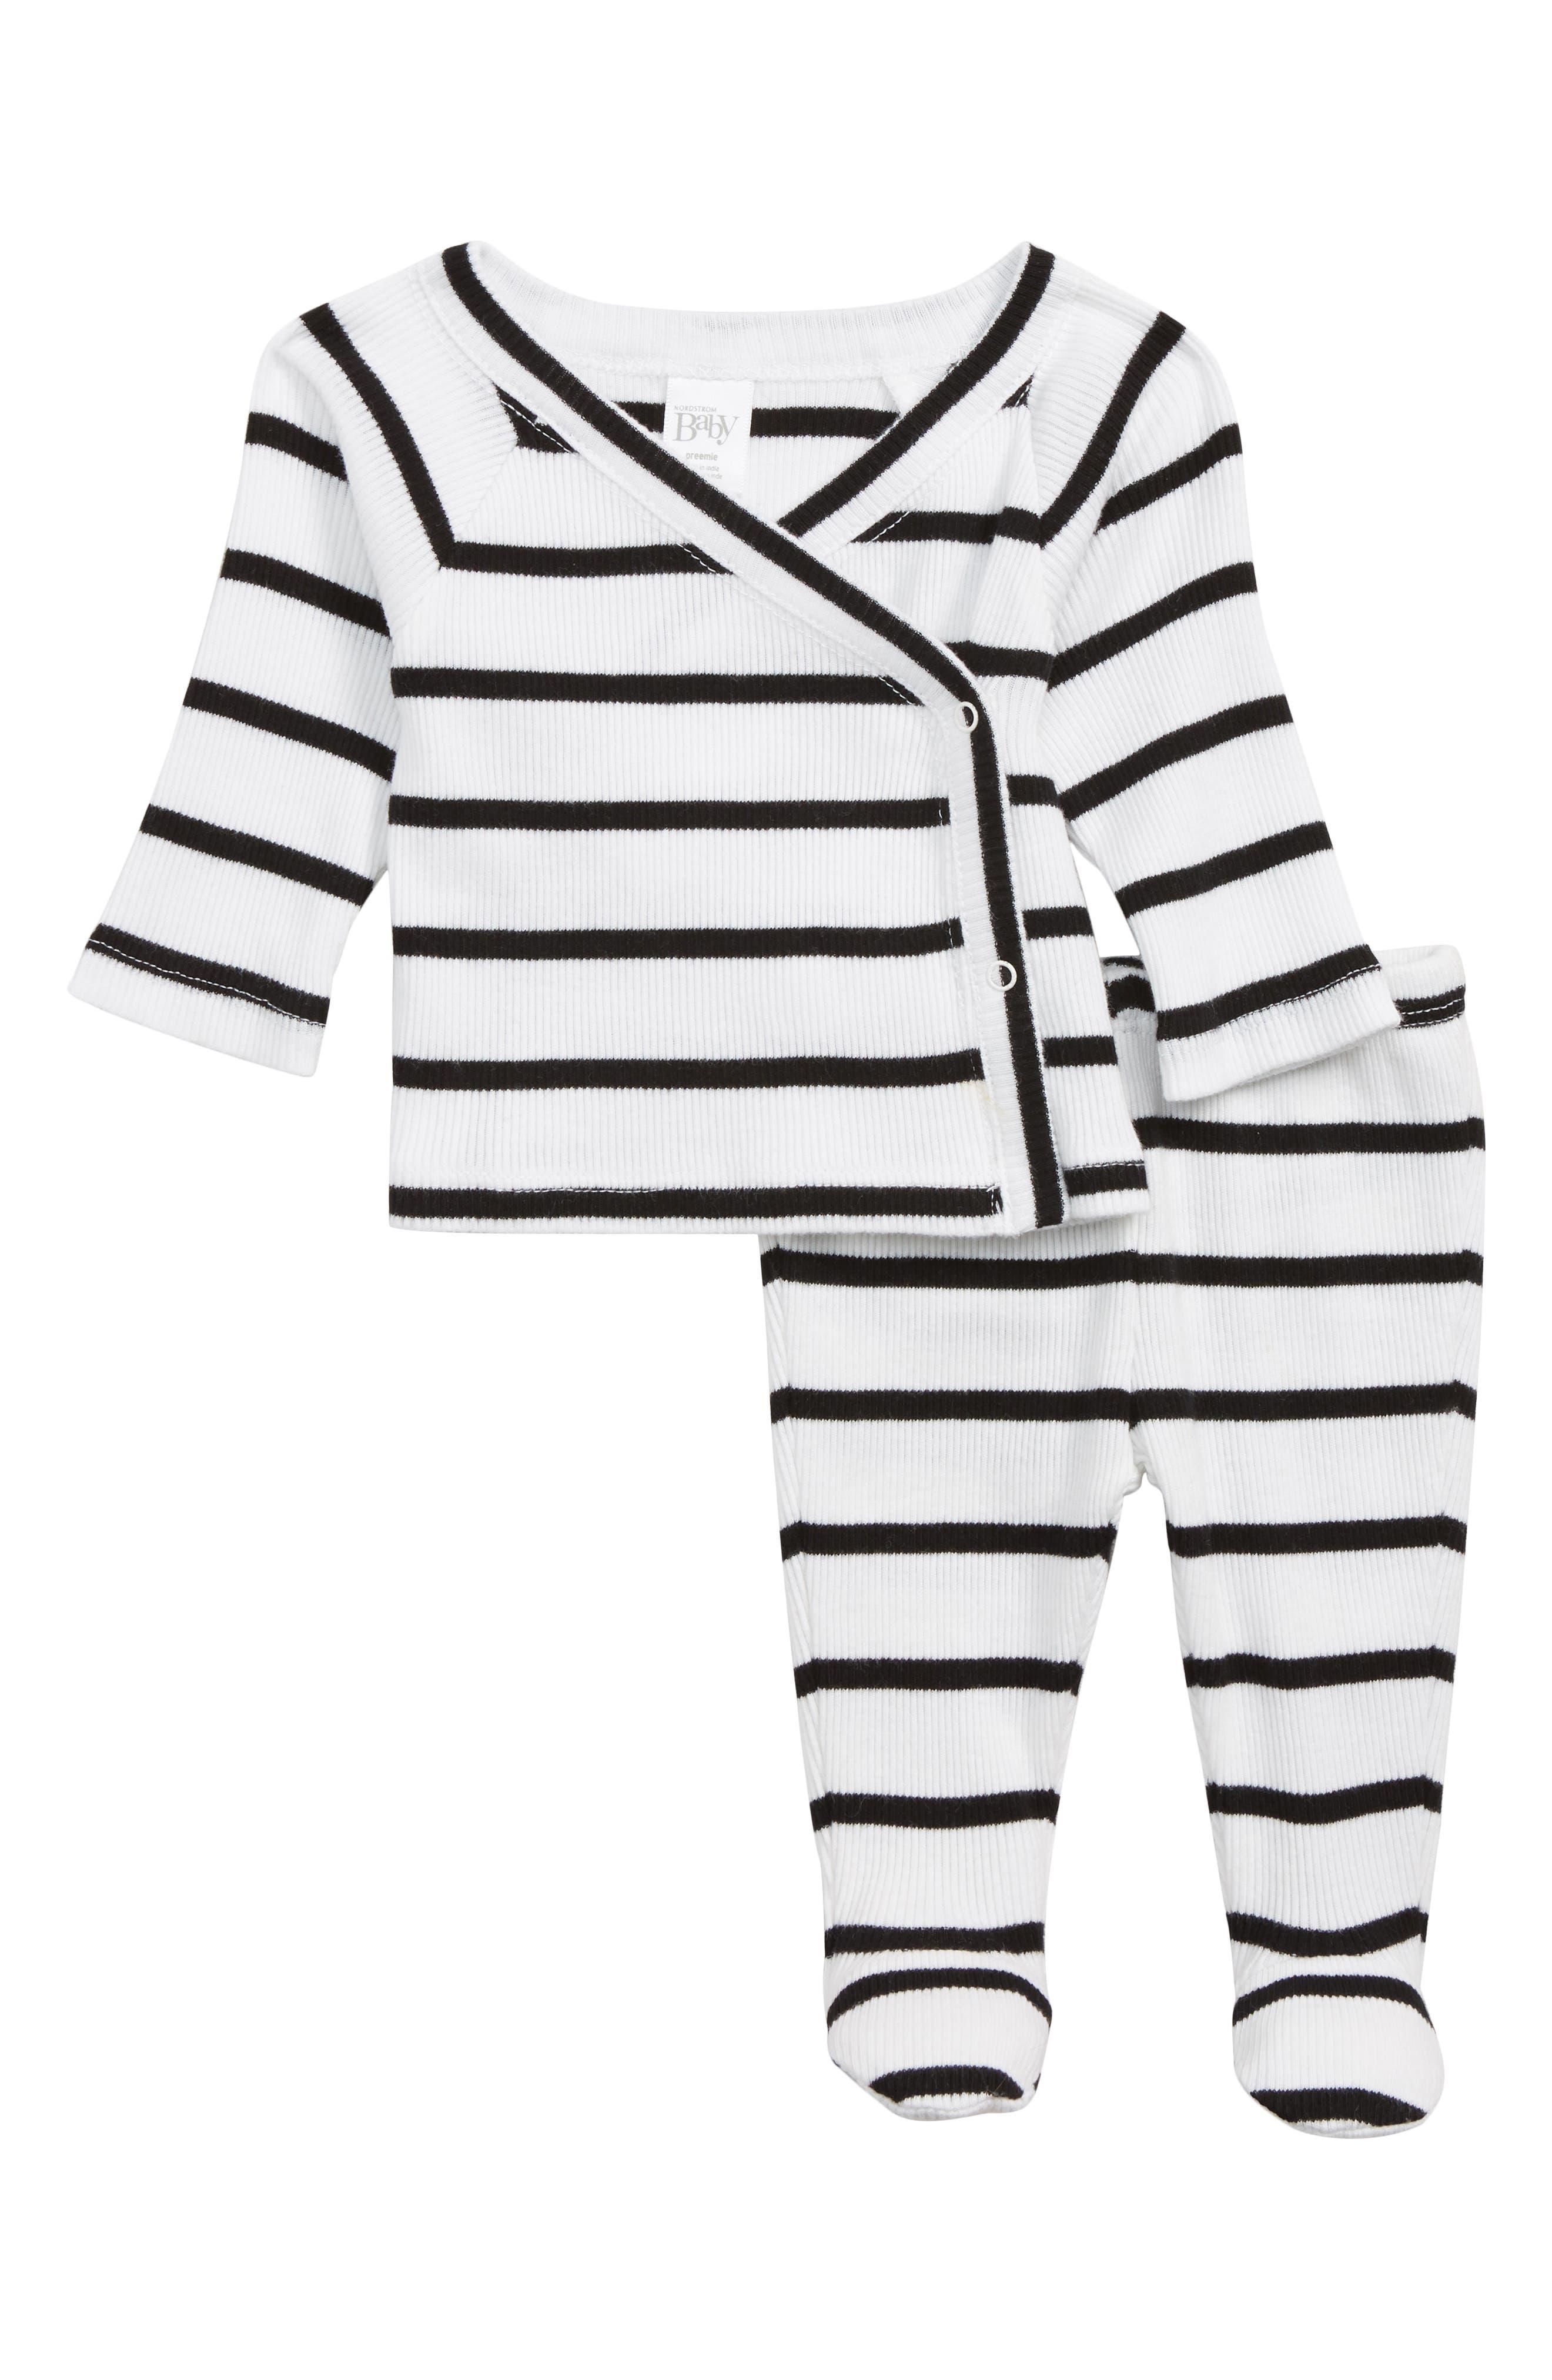 Wrap Top & Footed Pants Set,                         Main,                         color, WHITE- BLACK BRETON STRIPE